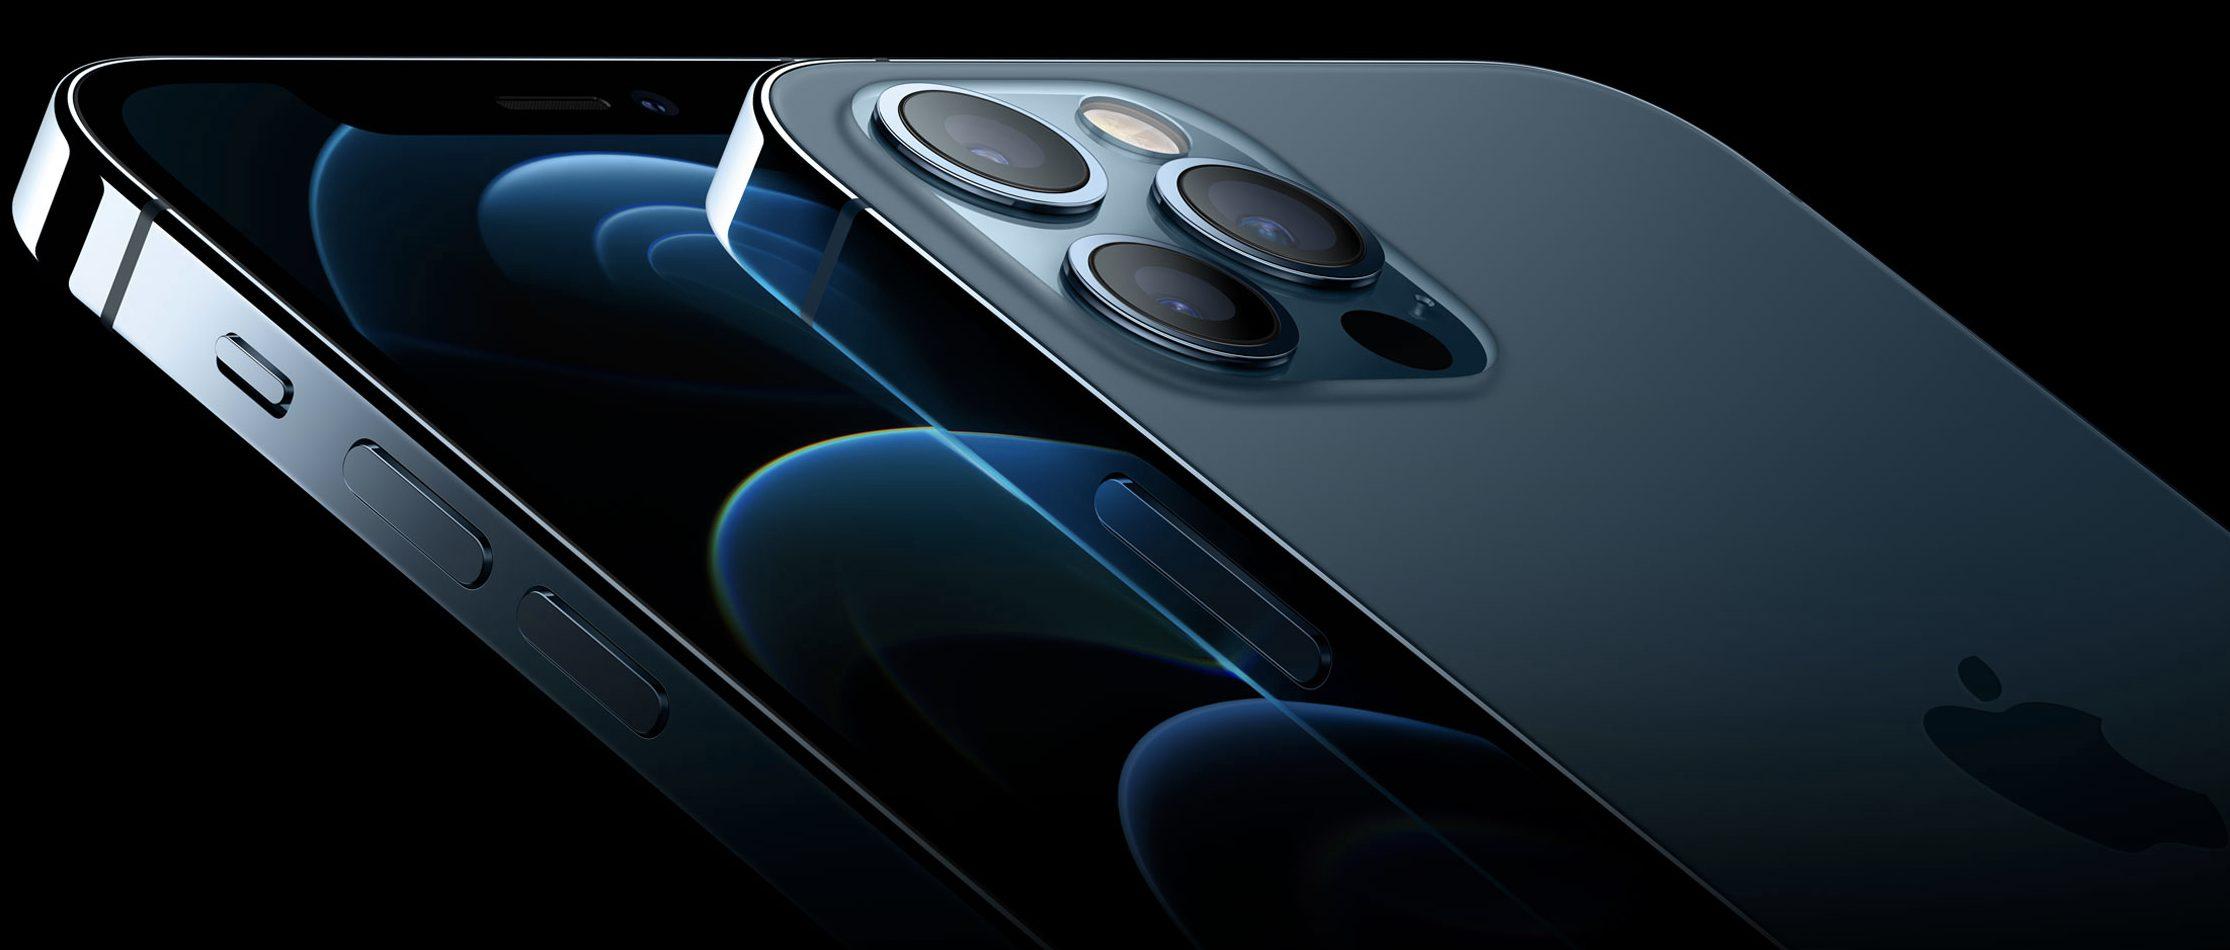 【iPhone12Pro】特徴、買取金額まとめ